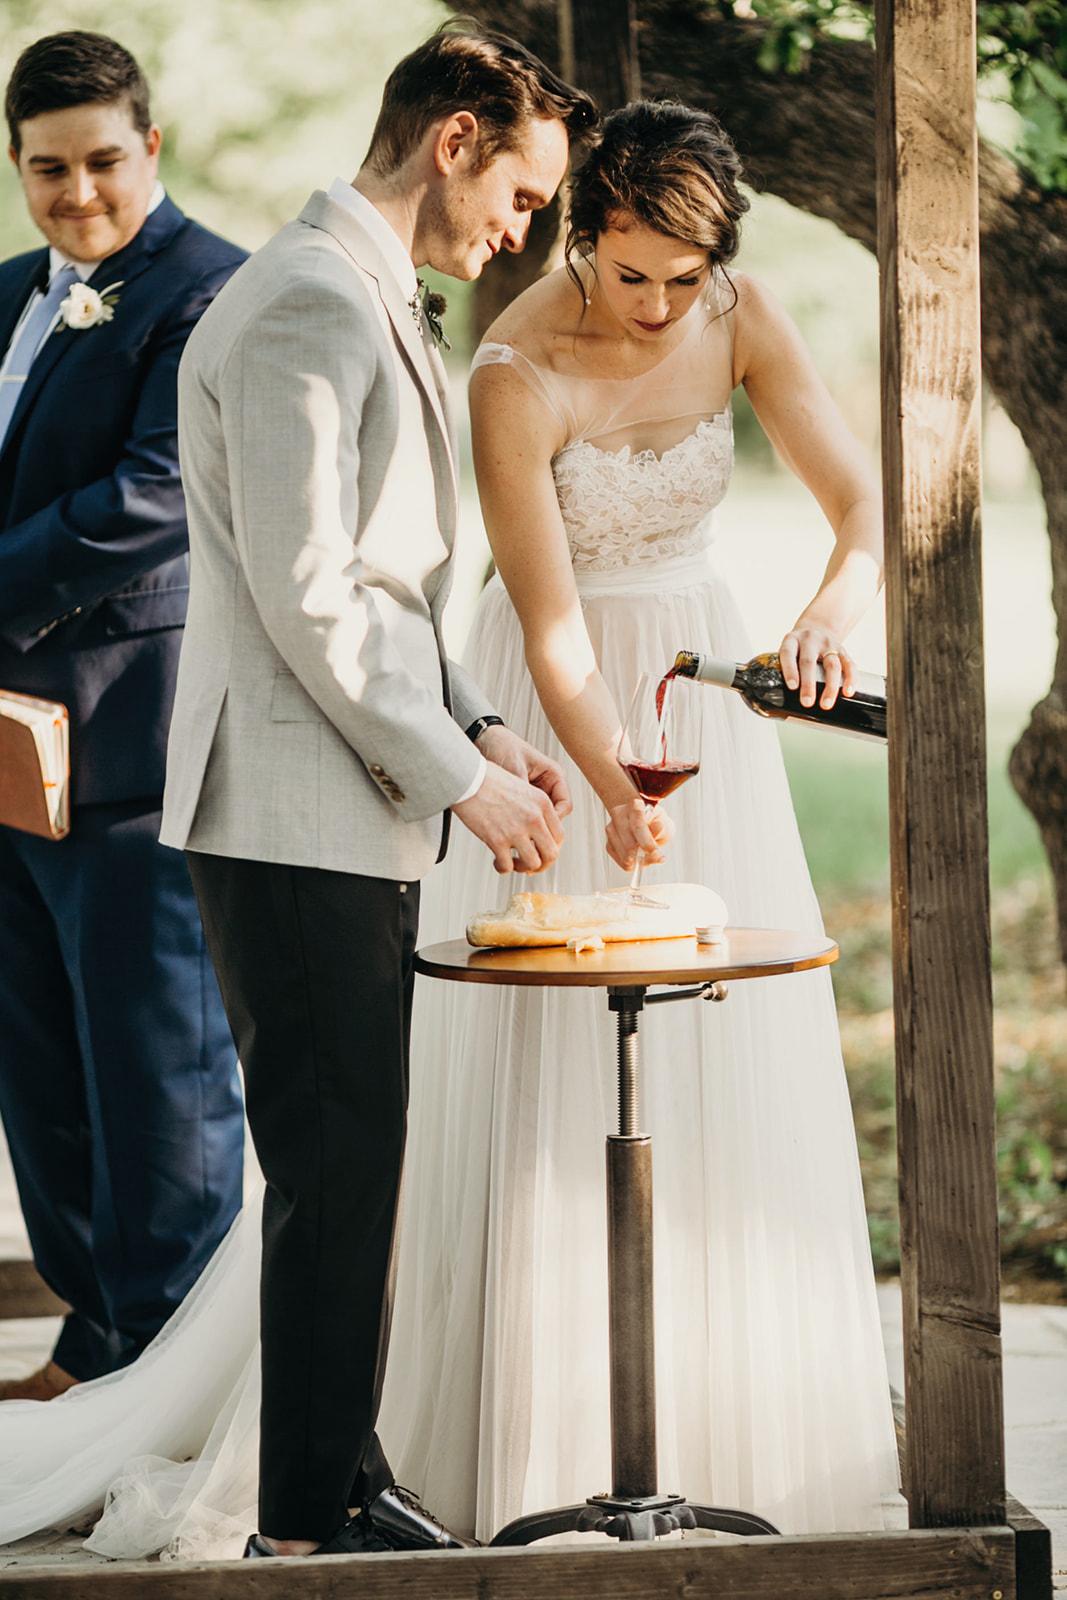 austin-wedding-lindsey-bryce-374.jpg